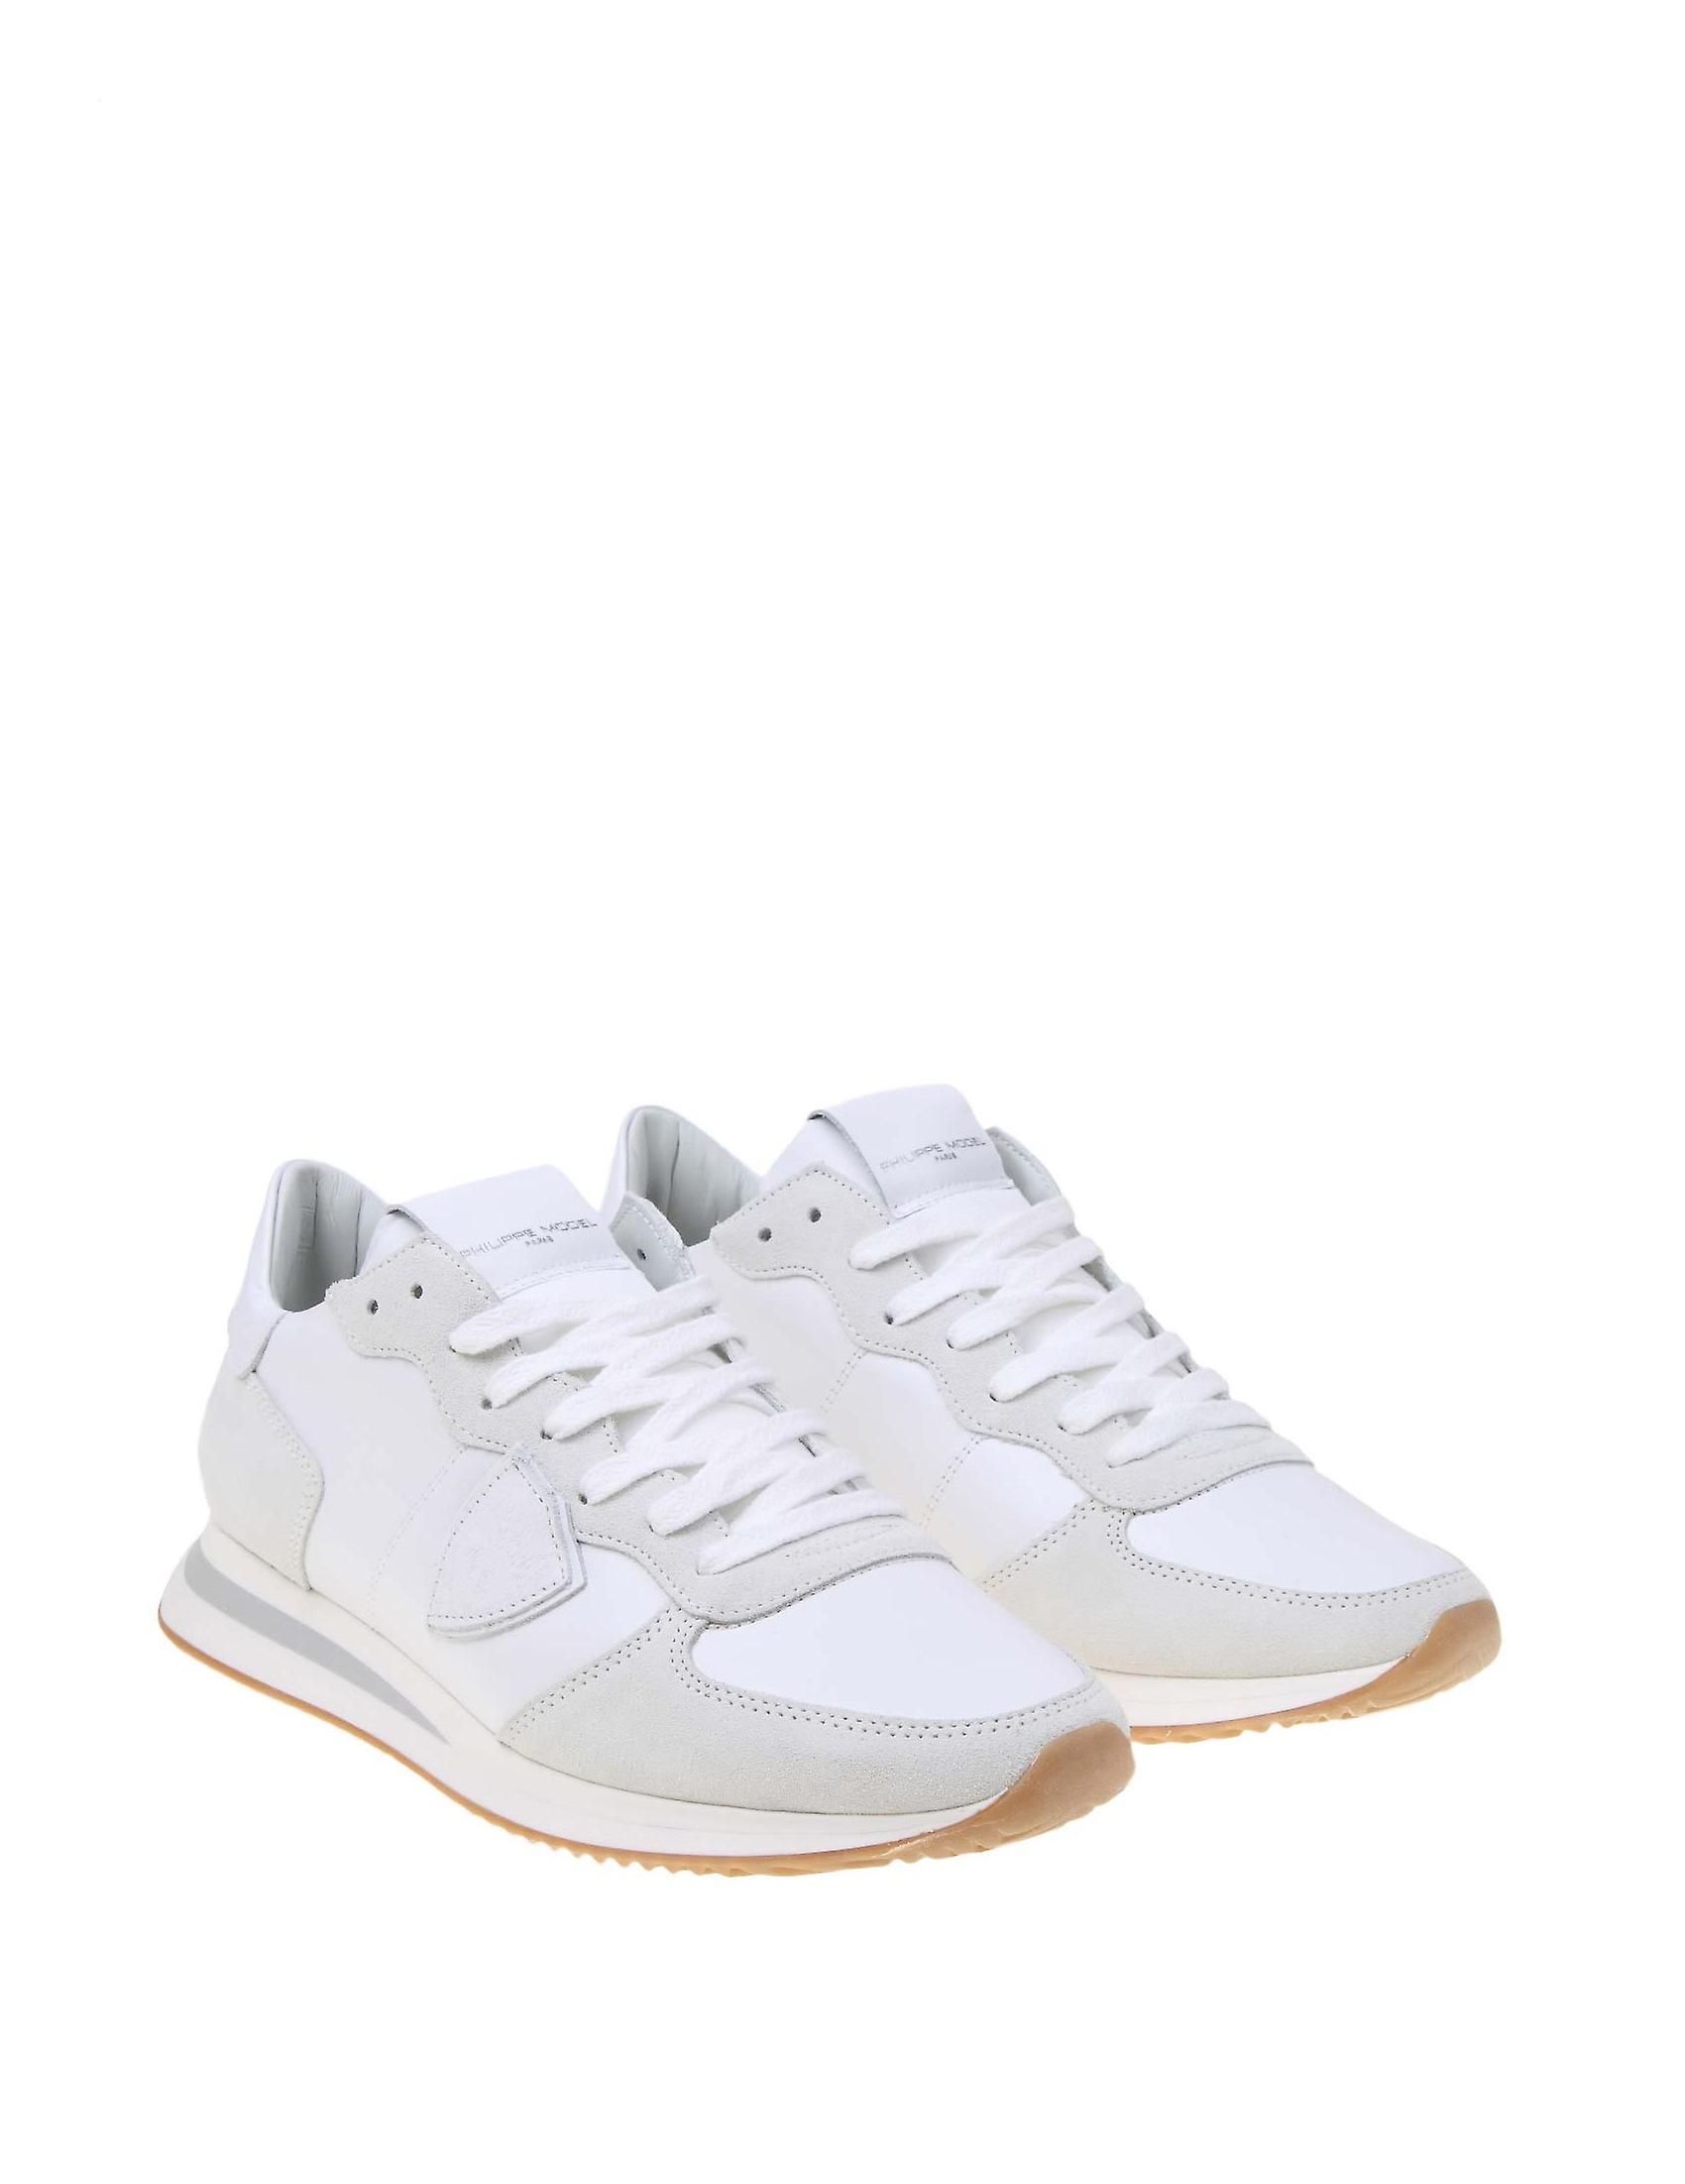 Philippe Model Tzlu5001 Hommes's Baskets en tissu blanc